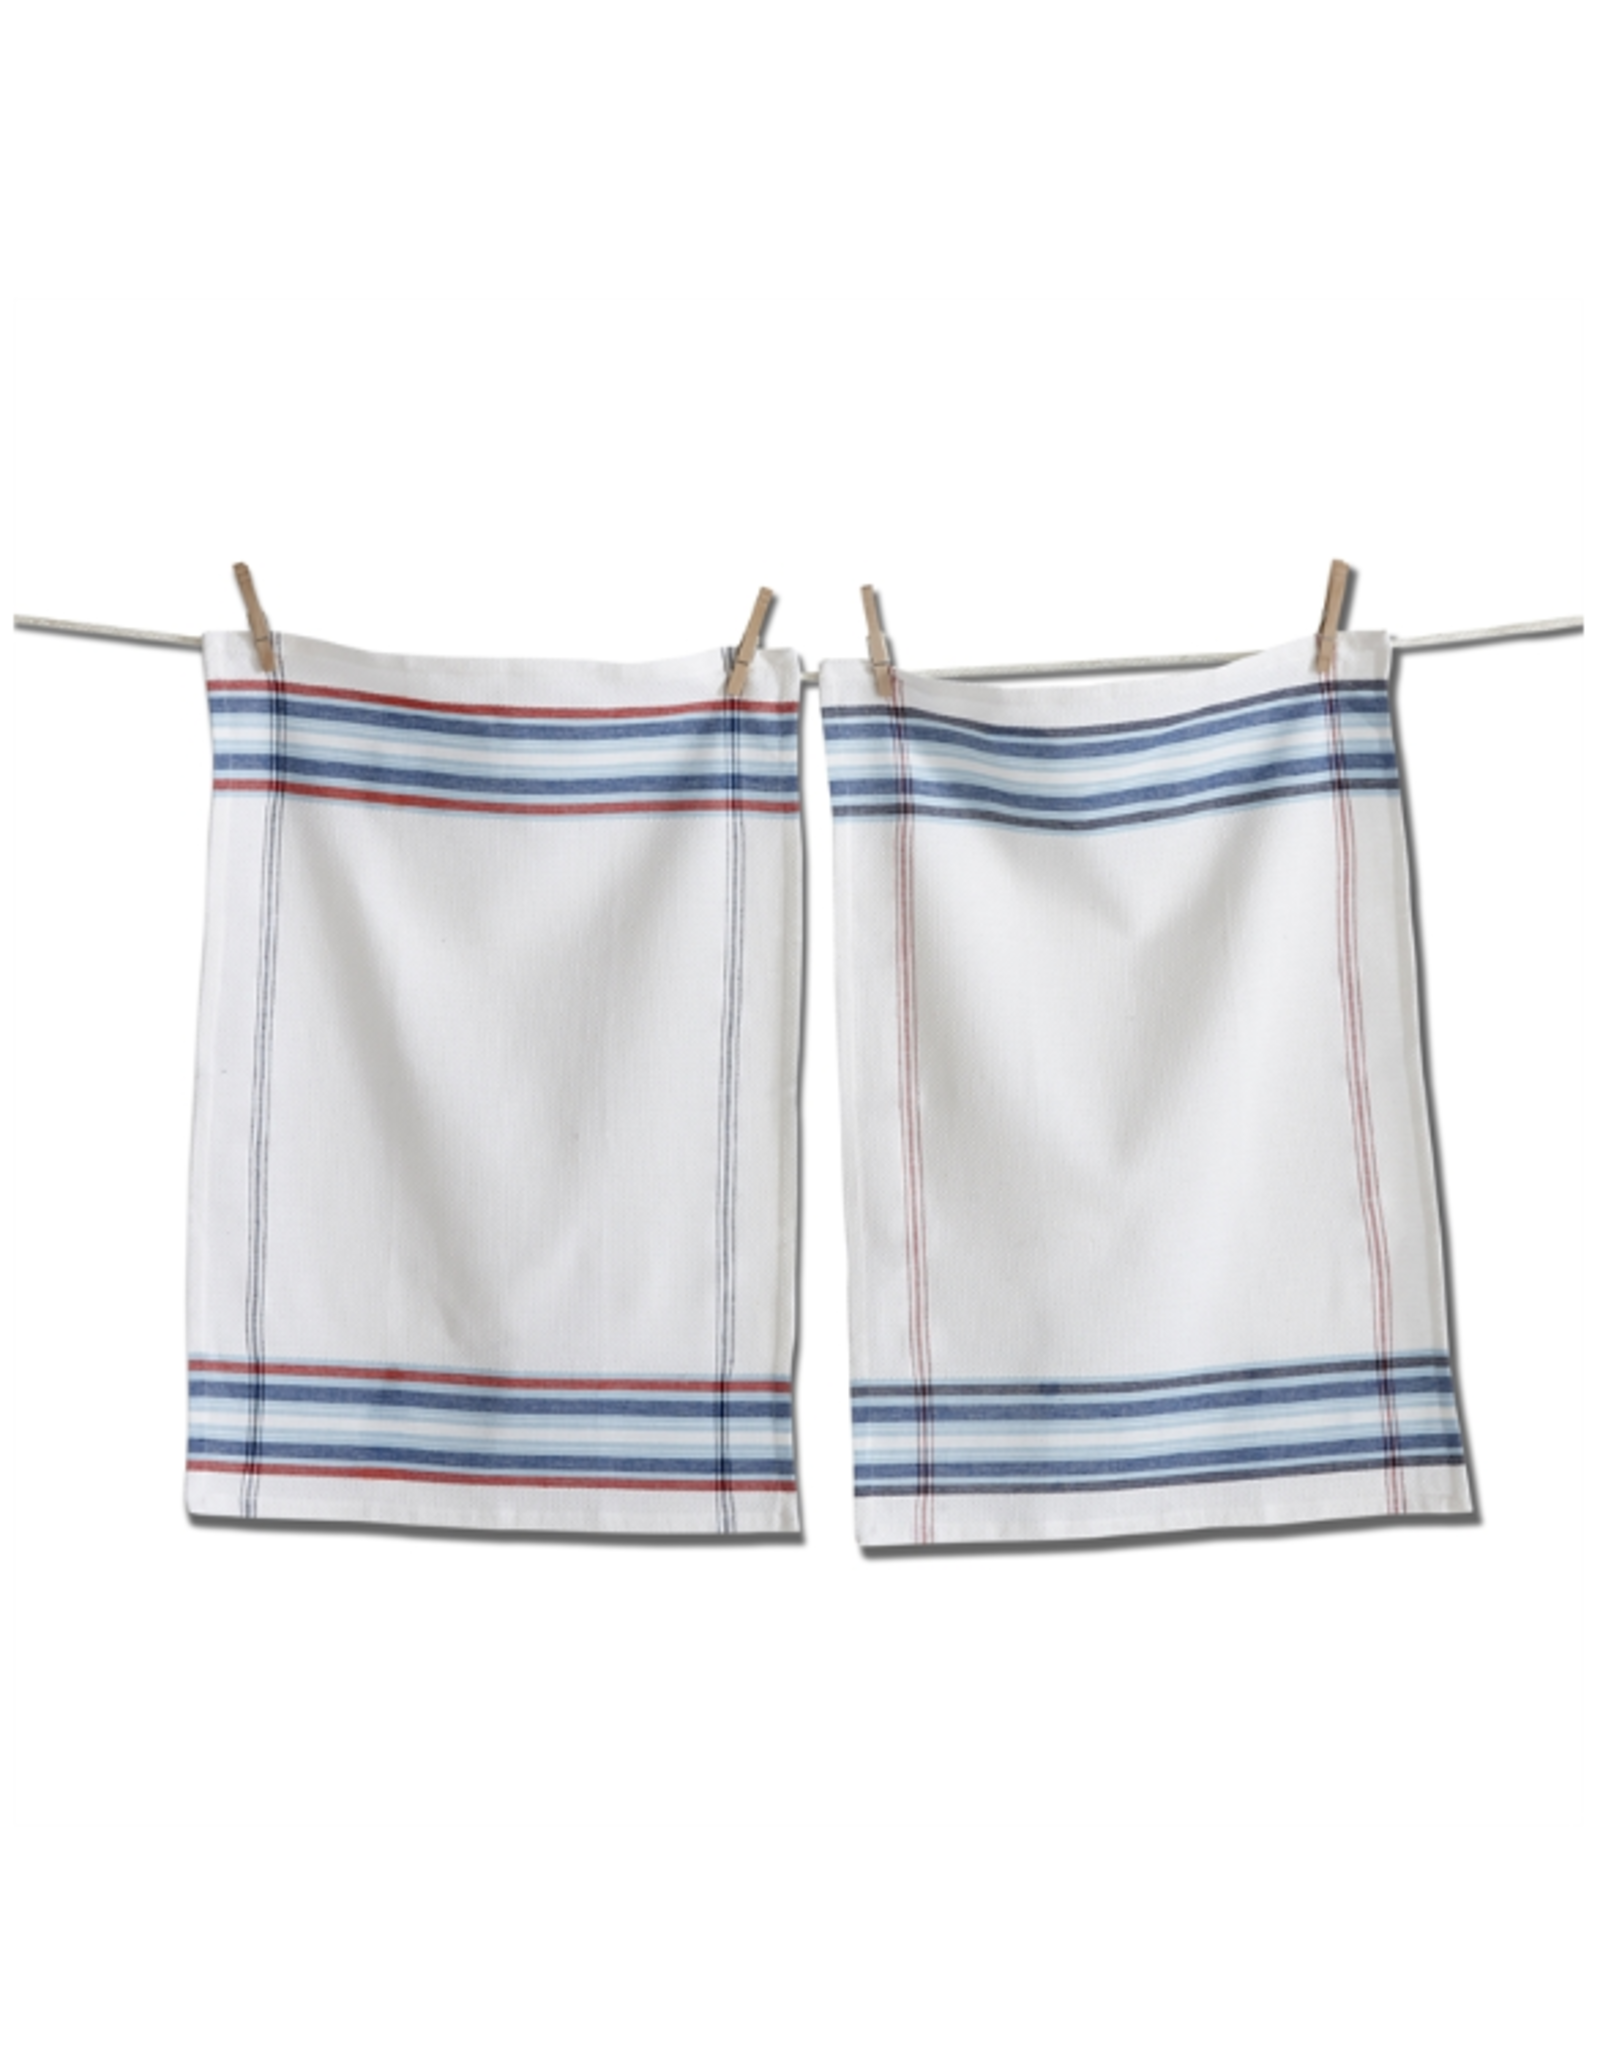 Tag Dishtowel S/2 - Americana Stripe